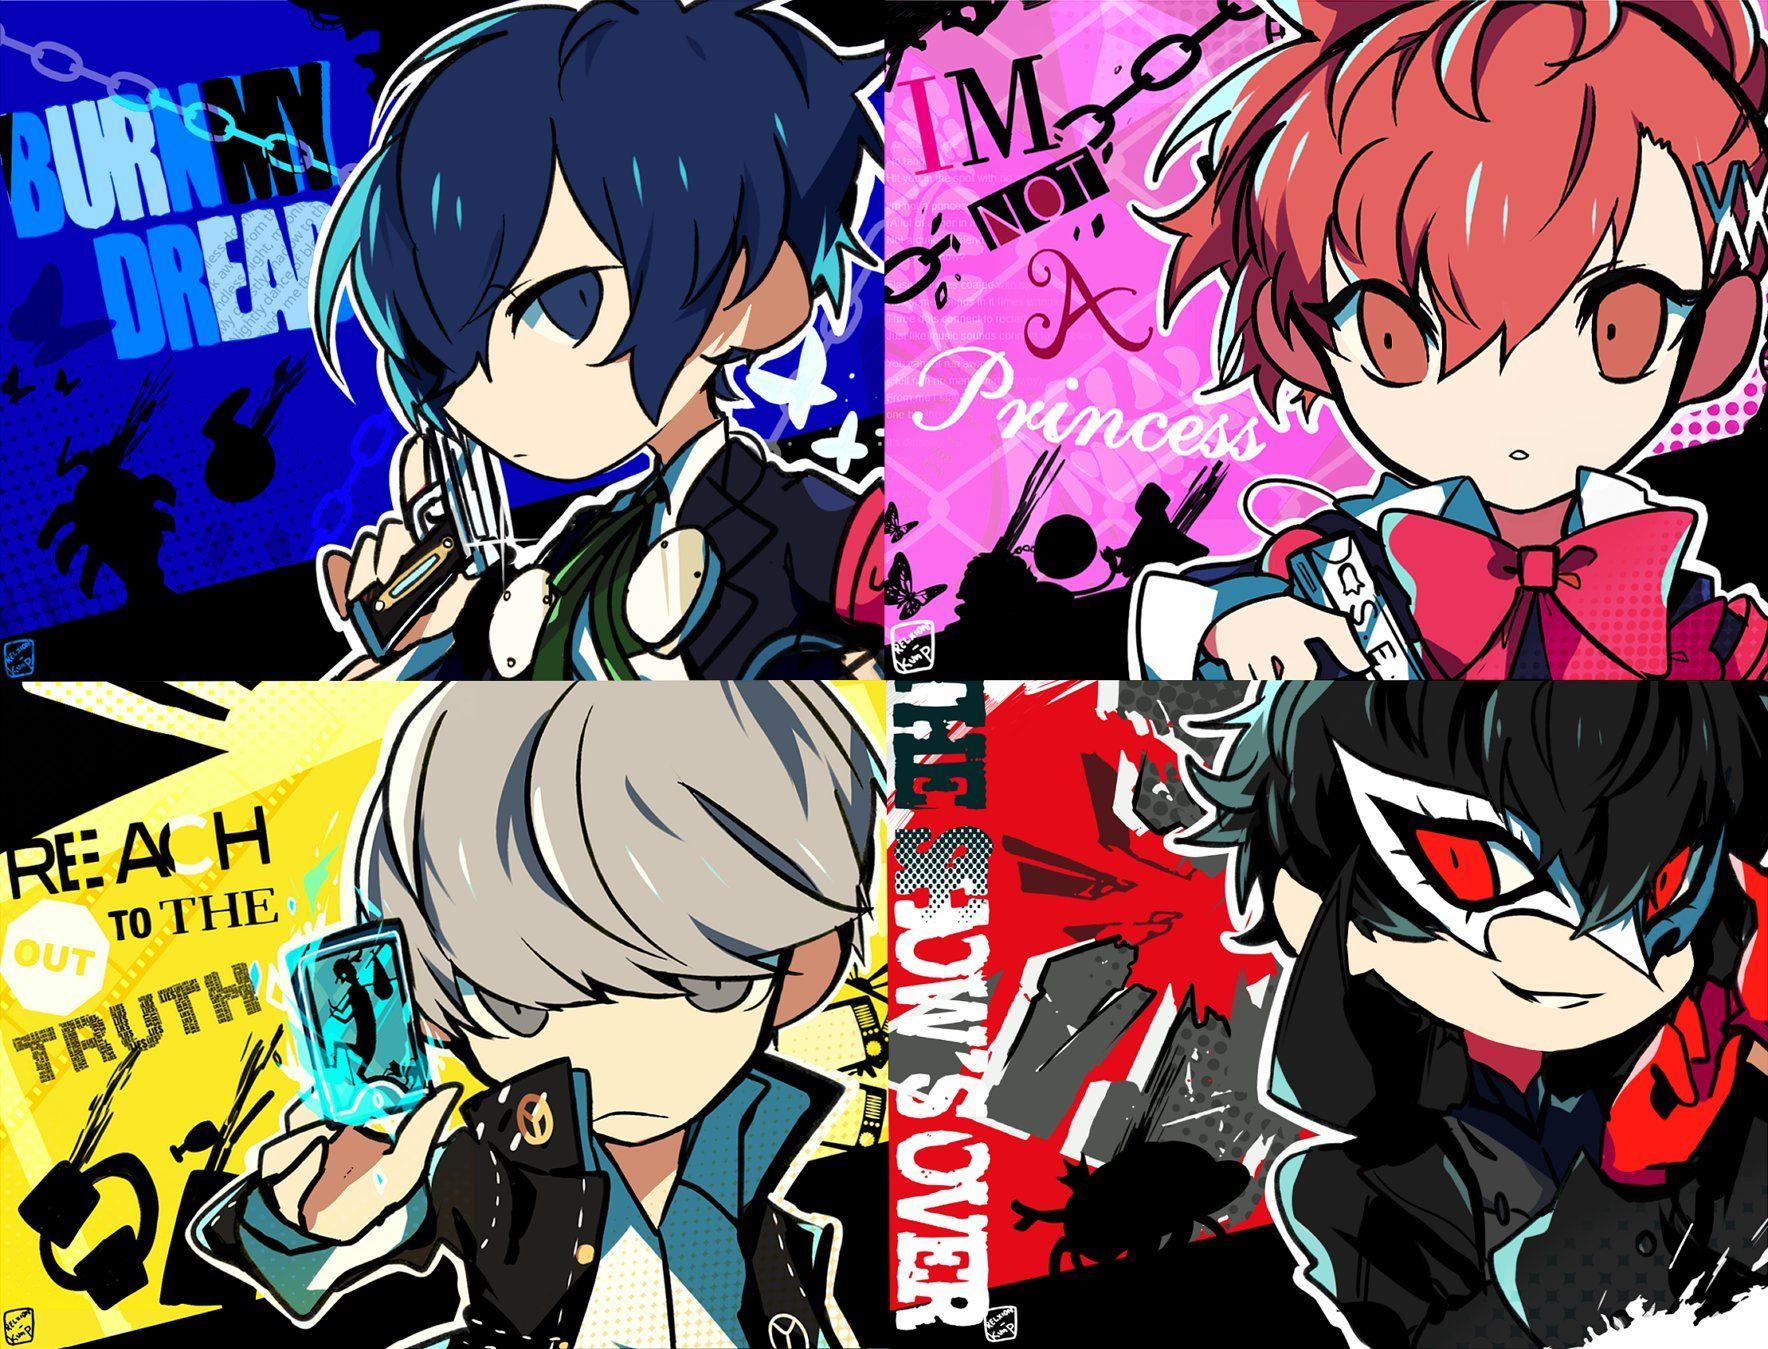 L3V1 STAN 😈 on Persona 5 memes, Persona 5 joker